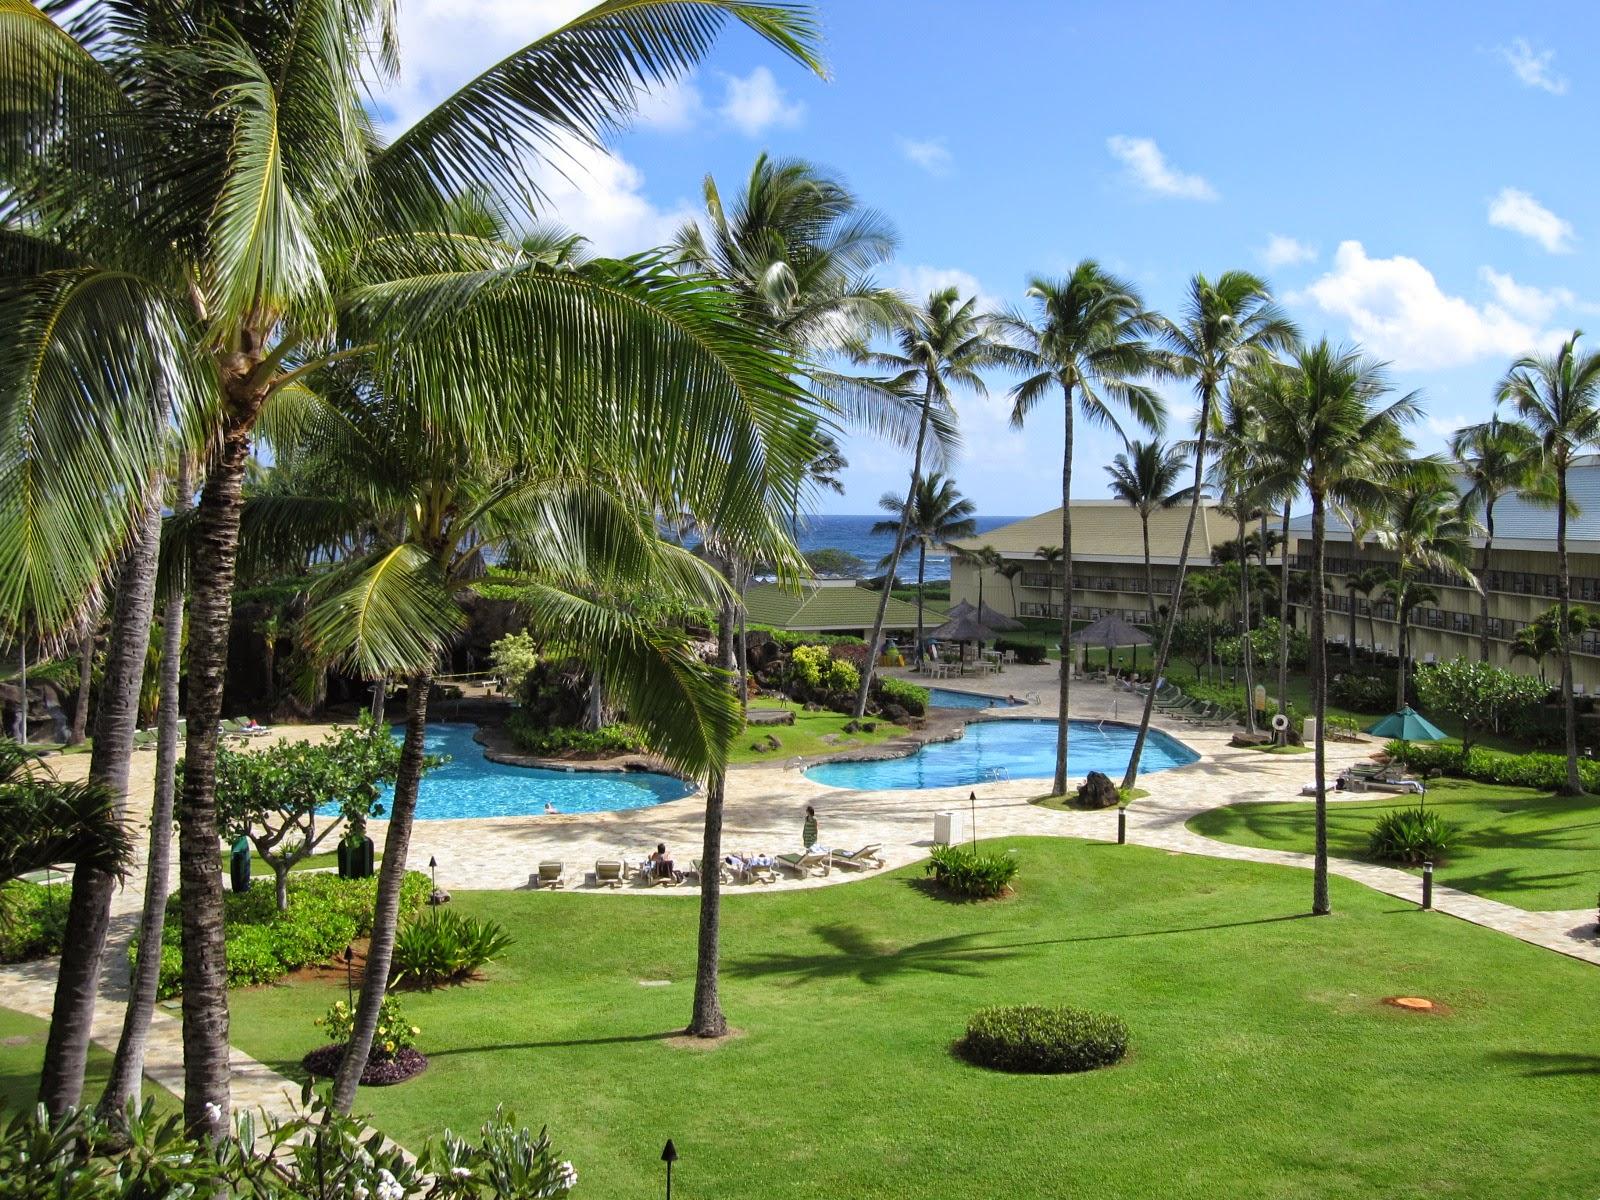 kauai real estate for sale just listed kauai beach